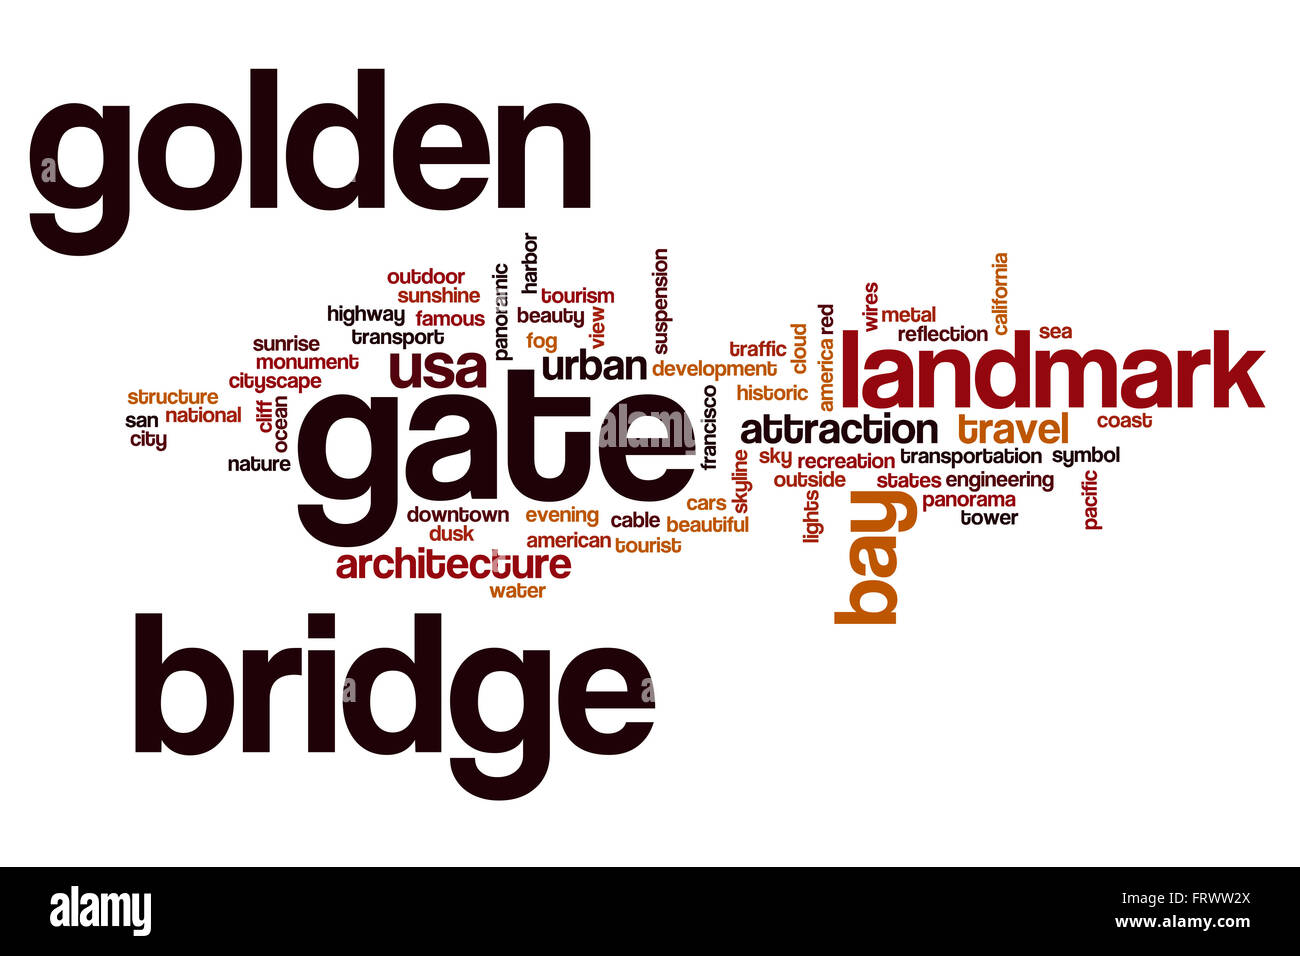 Golden Gate Bridge word cloud - Stock Image